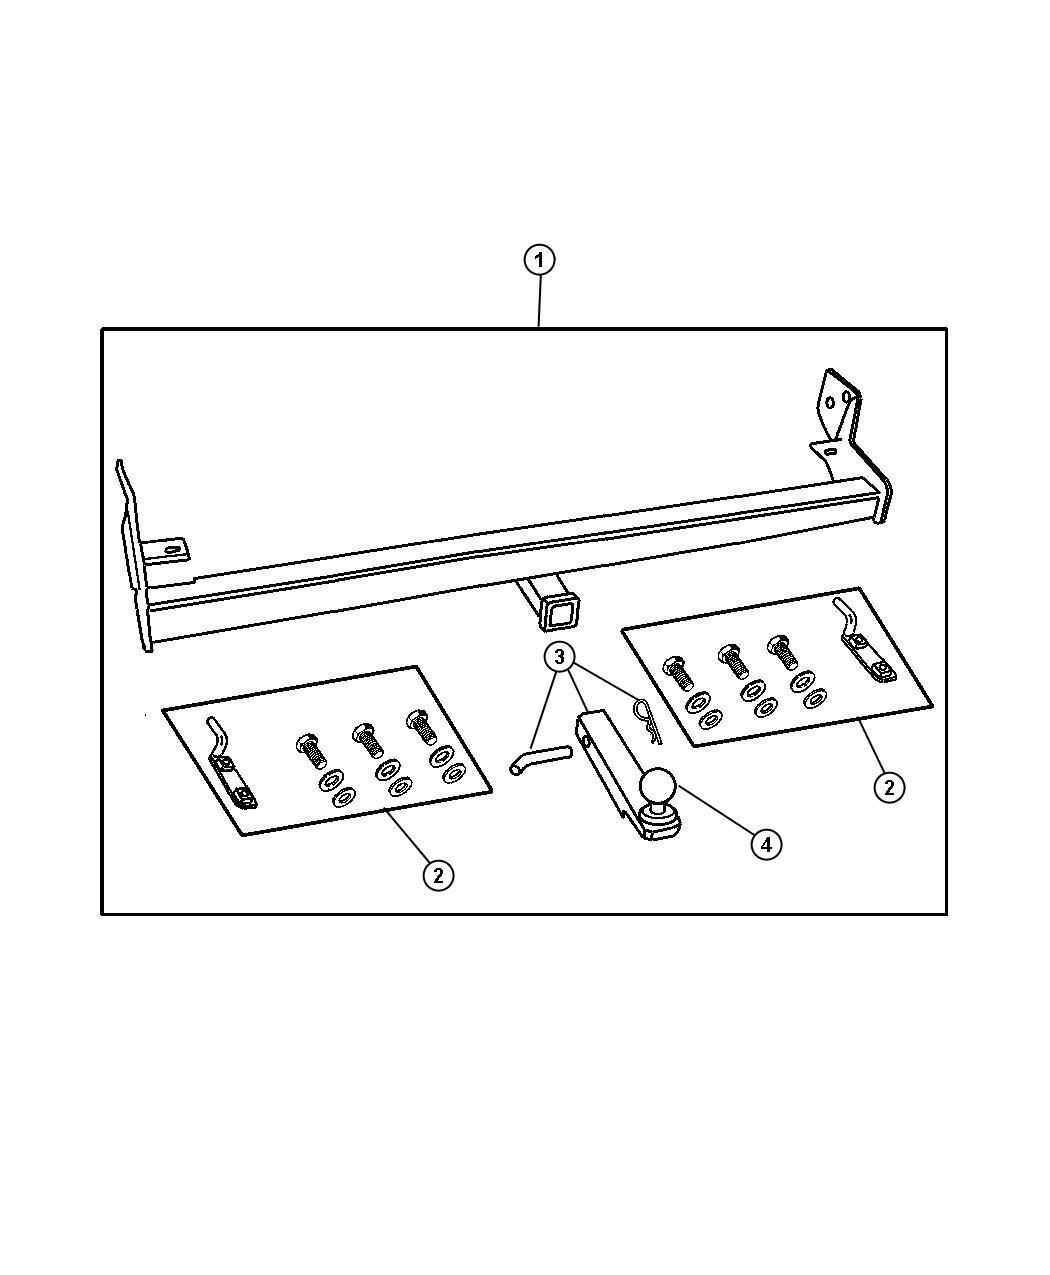 Dodge Grand Caravan Adapter Kit Drawbar Attachment Ball Mount Includes Drawbar Pin And